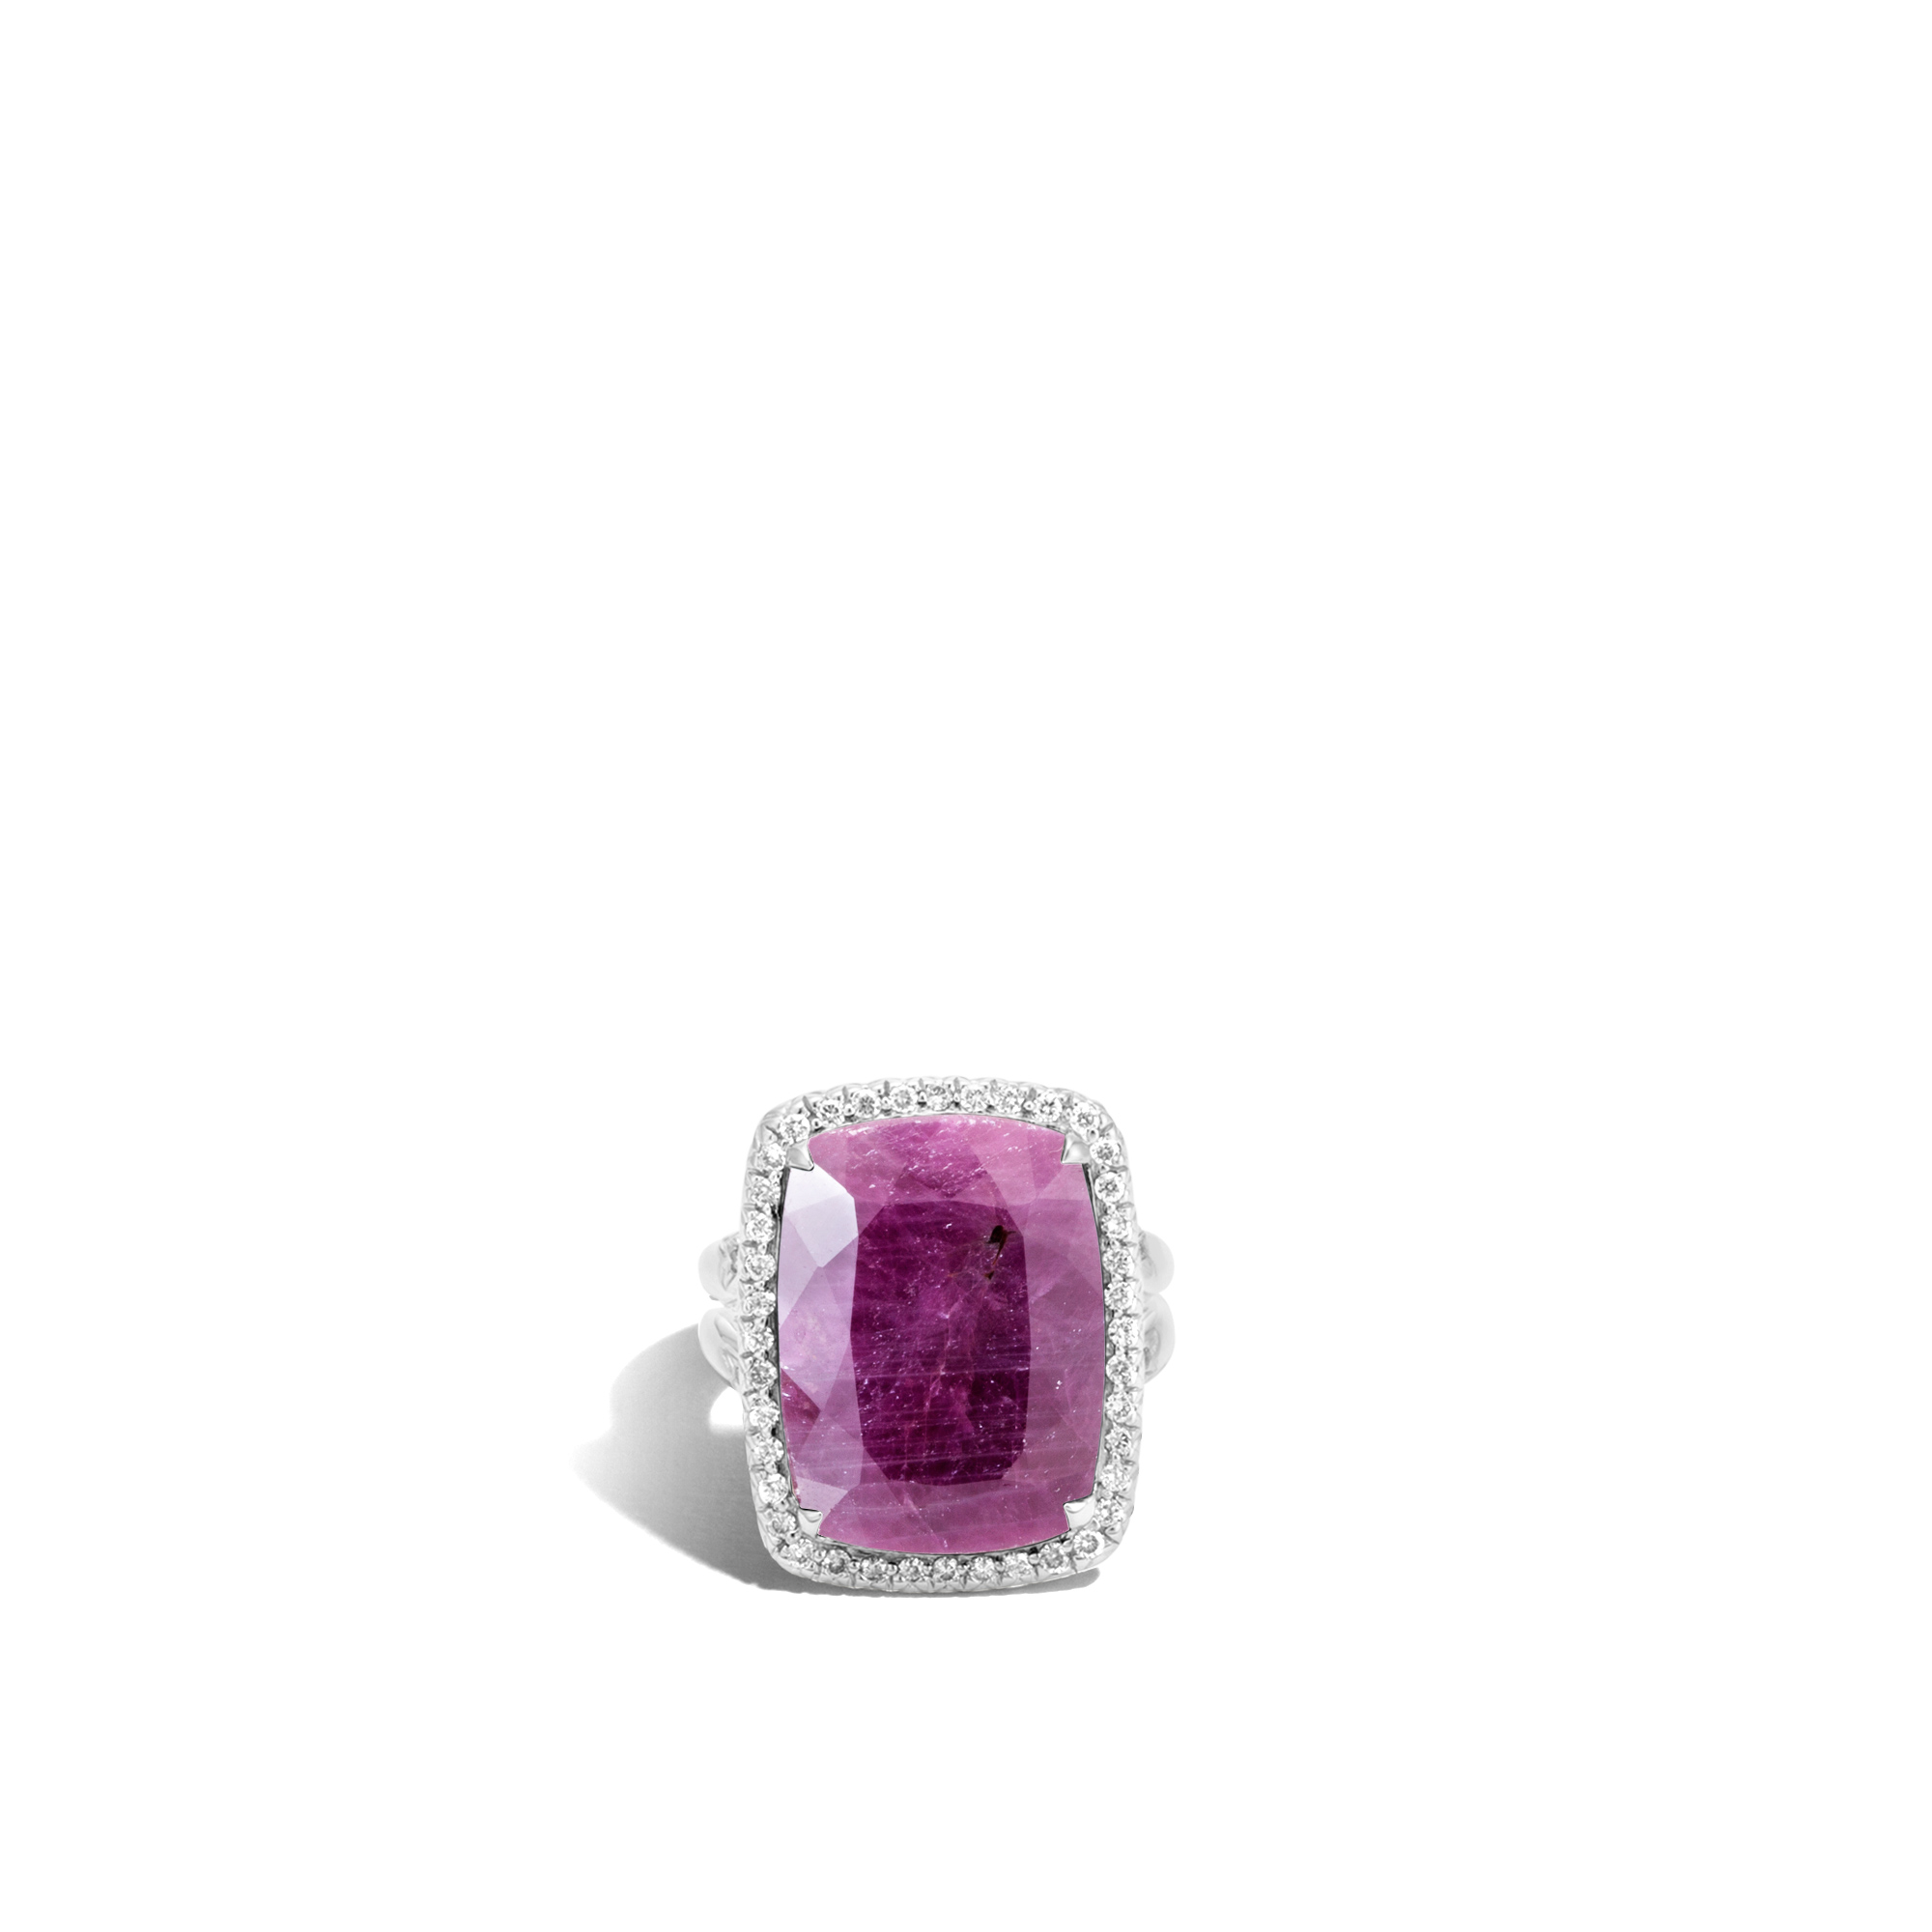 Classic Chain Magic Cut Ring, Silver, 20x15MM Gems, Diamonds, Indian Ruby, large